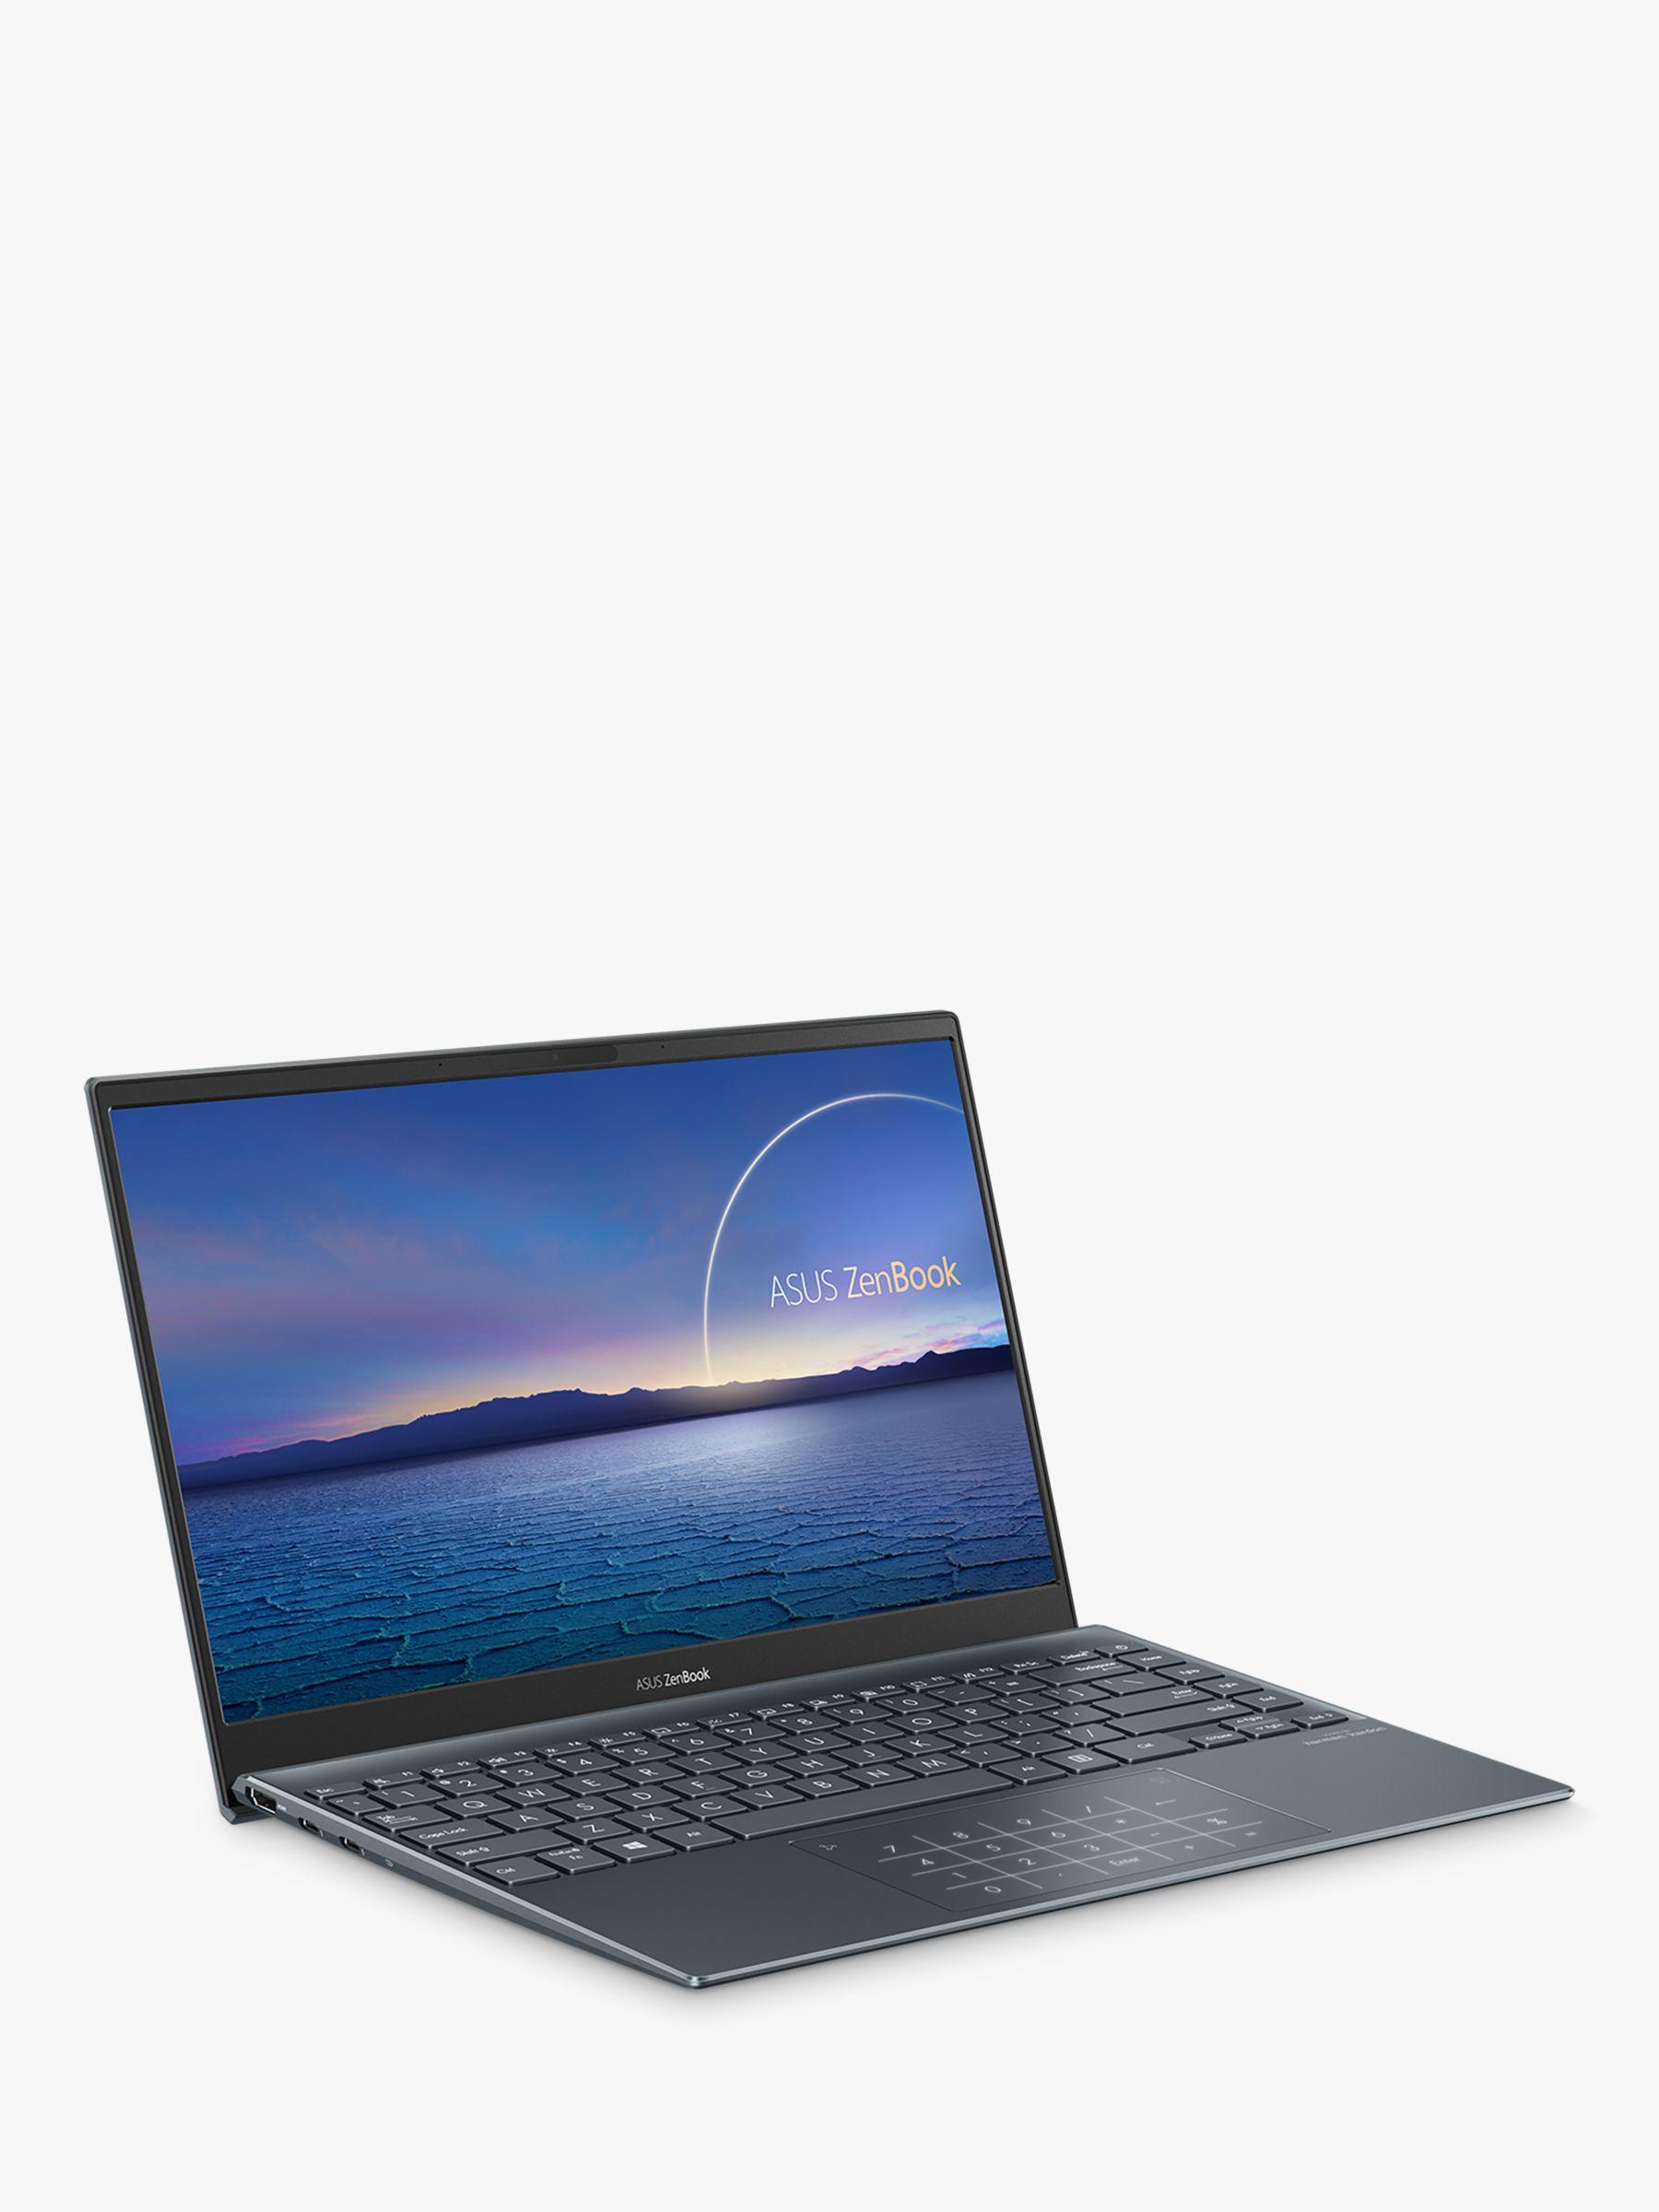 ASUS ZenBook 13 UX325JA Laptop with NumberPad, Intel Core i5 Processor, 8GB RAM, 512GB SSD + 32GB Intel Optane Memory, 13.3 Full HD